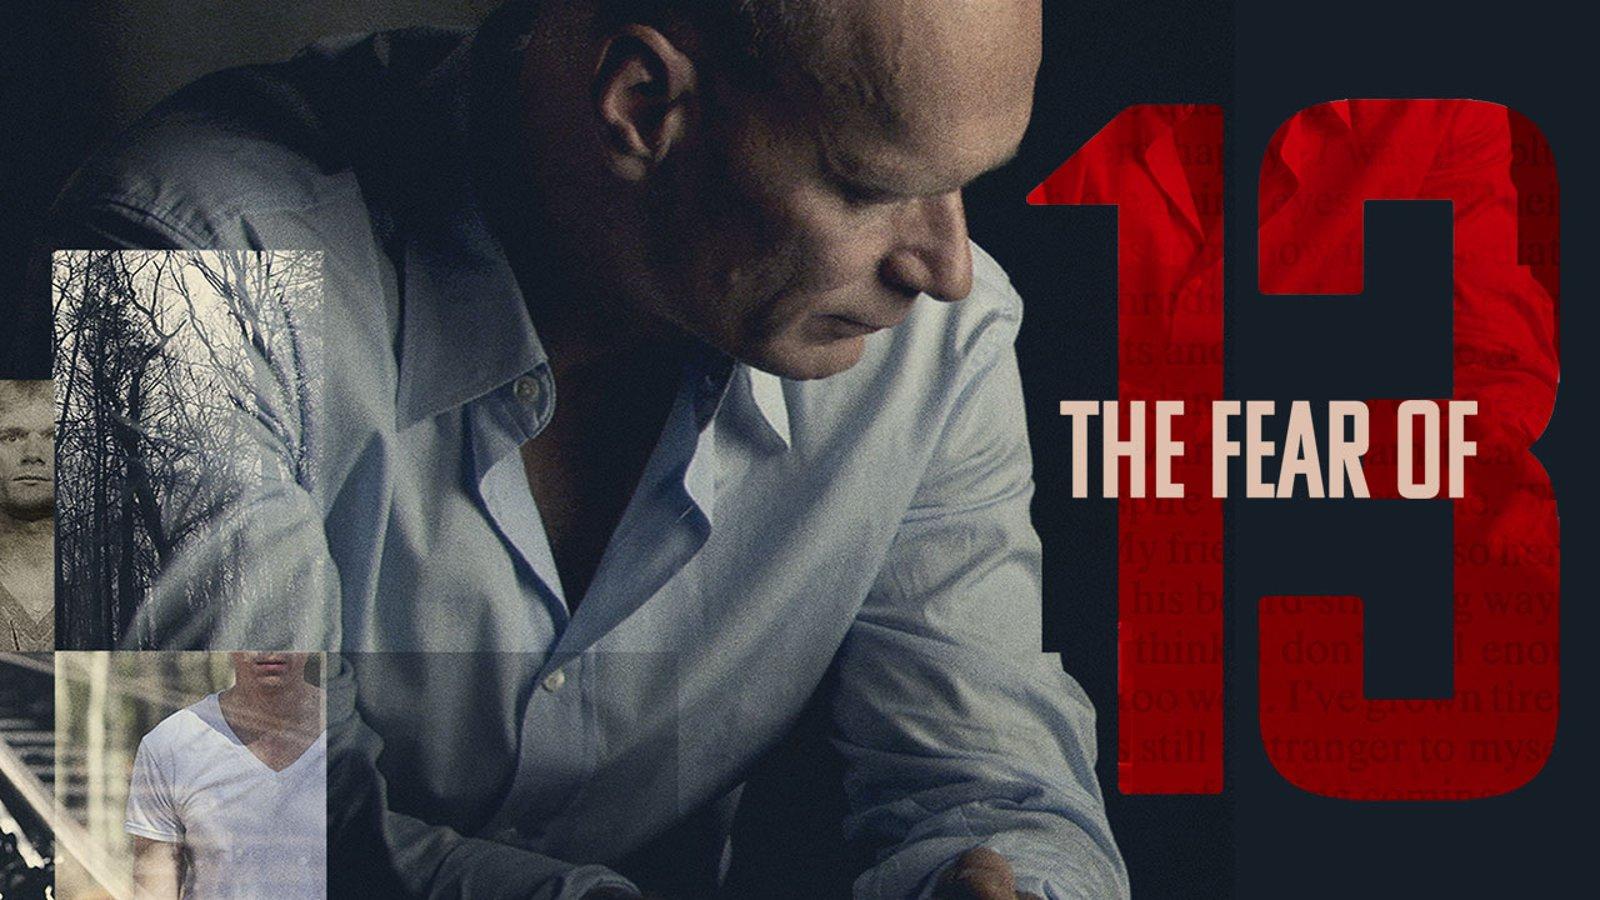 The Fear of 13 - A Crime Drama